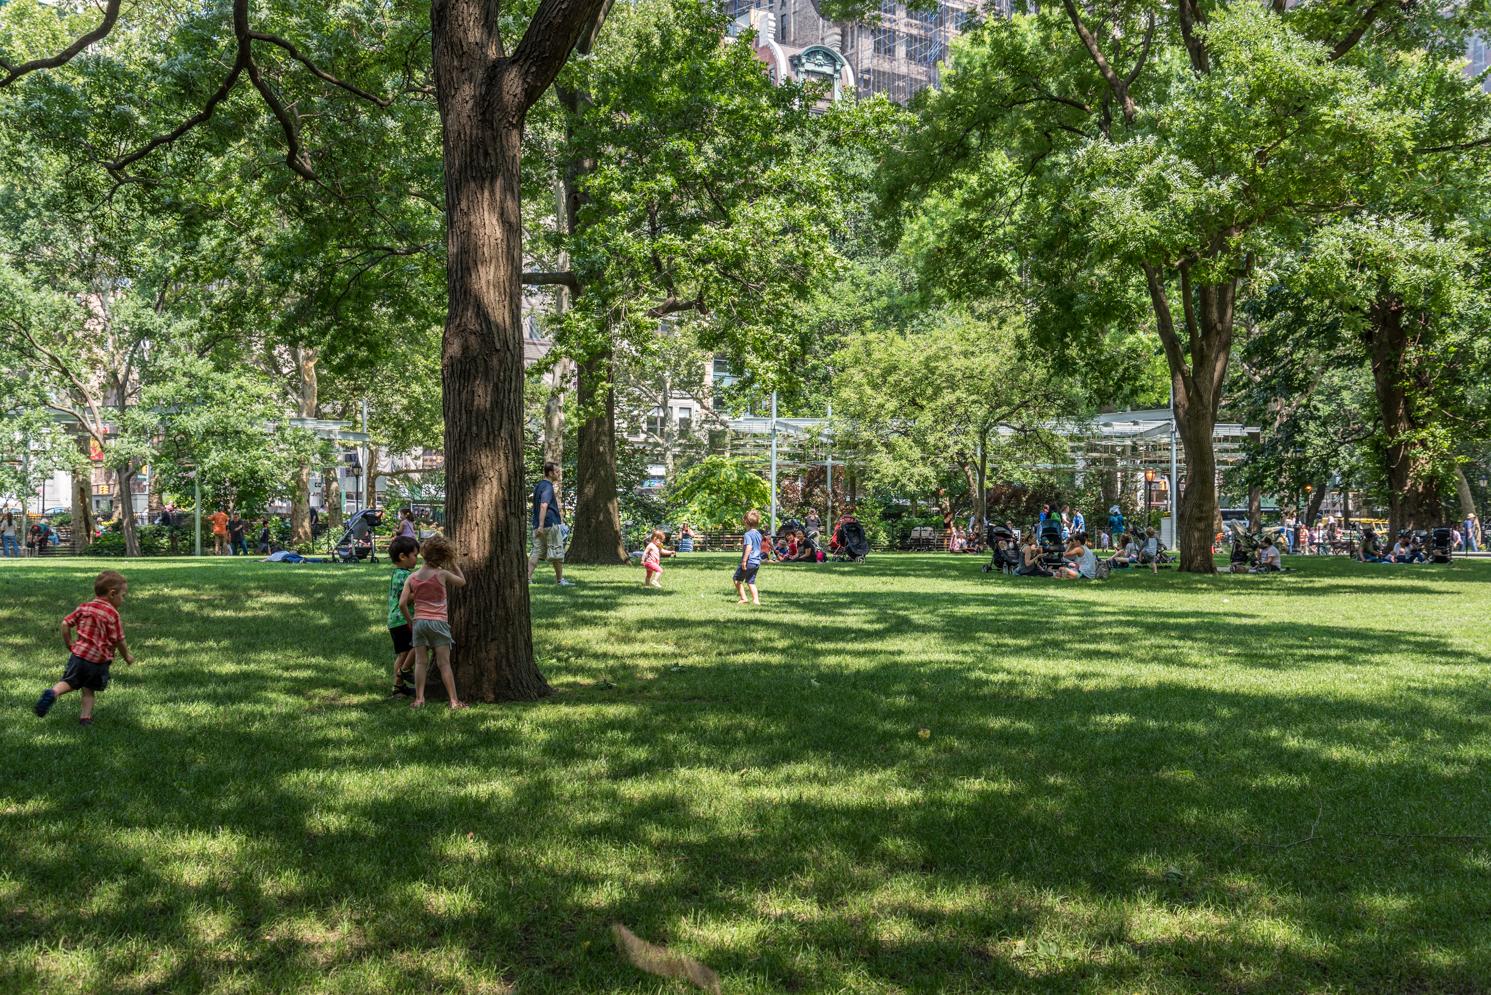 ROCK MAMA NYC LIFESTYLE BLOG - summer fun at madison square park